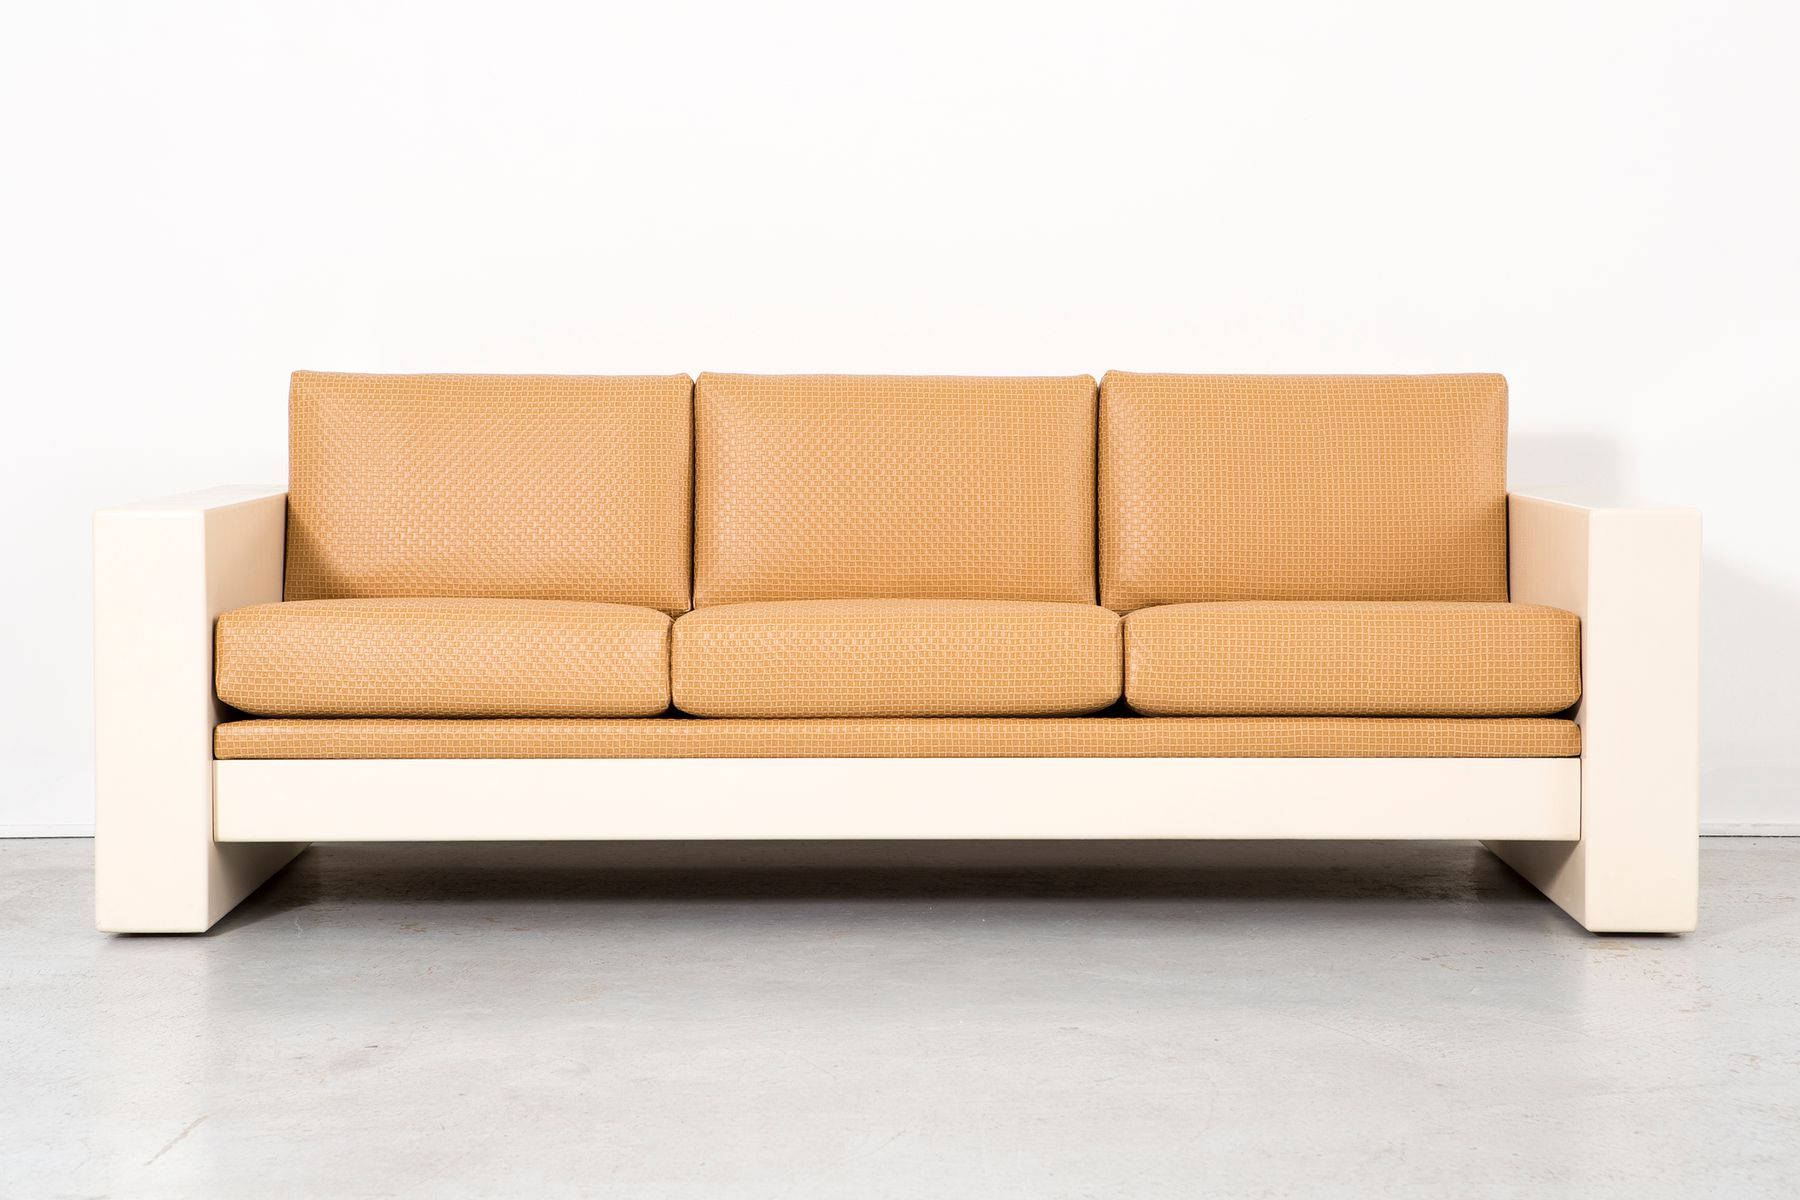 Vintage Sofa by Brian Kane for Metropolitan for sale at Pamono